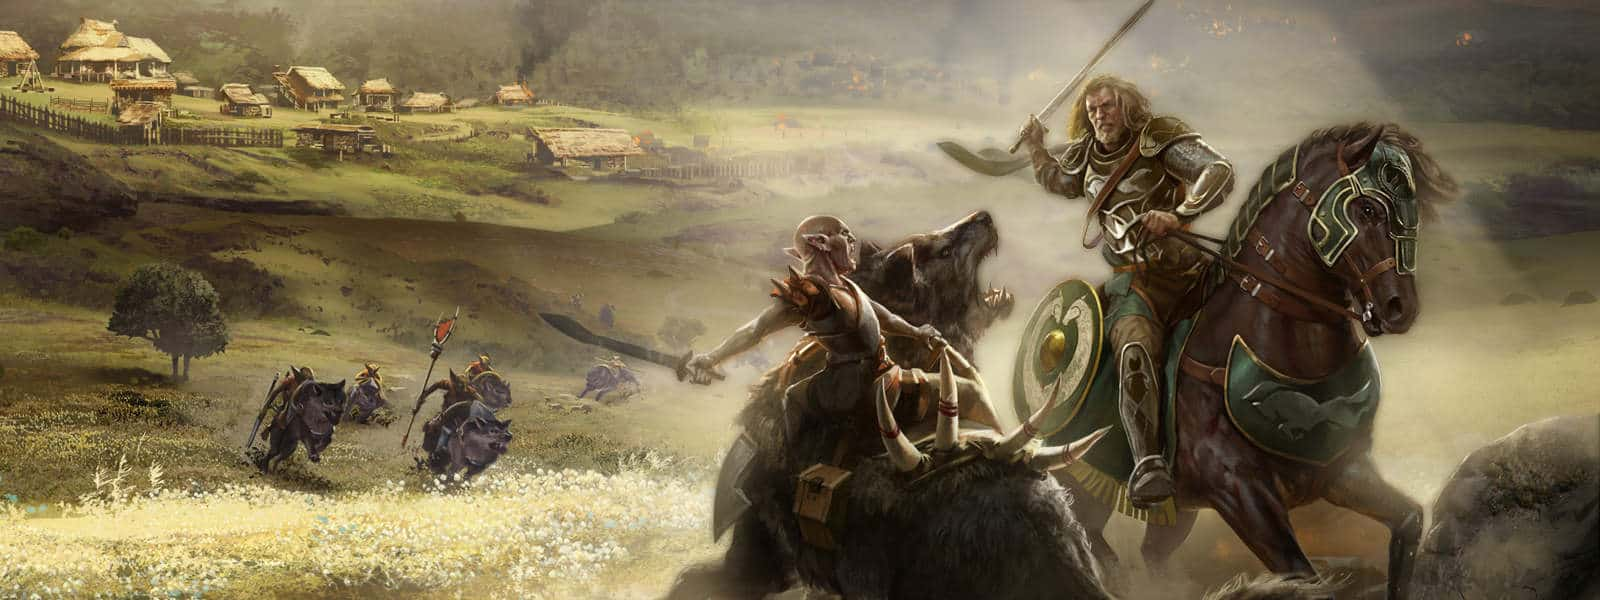 LOTRO Legendary Servers: Riders of Rohan